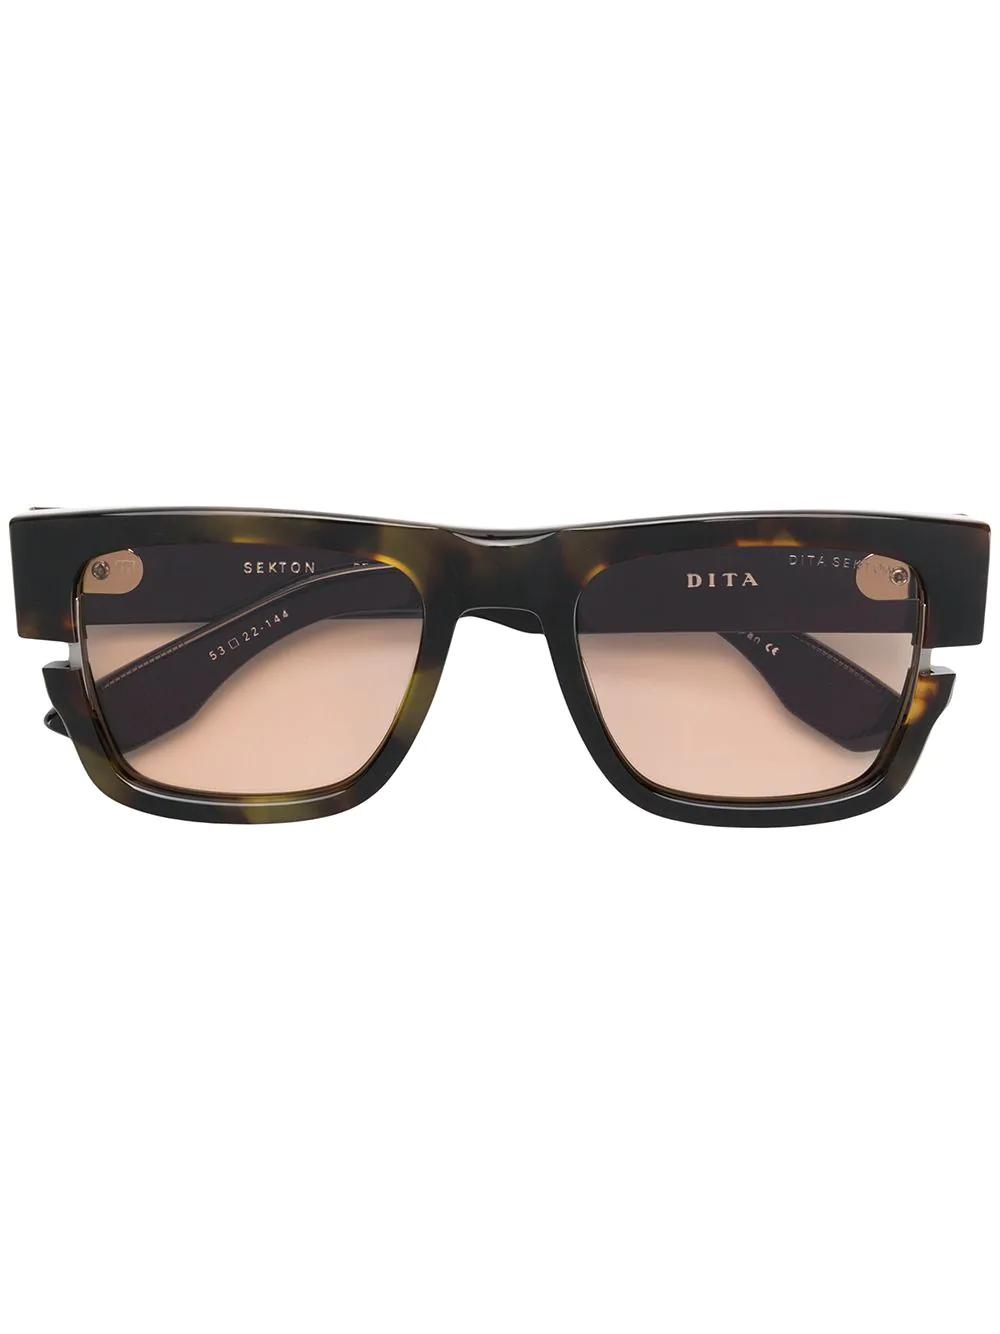 35883061fb5e Dita Eyewear Sekton Sunglasses - Brown